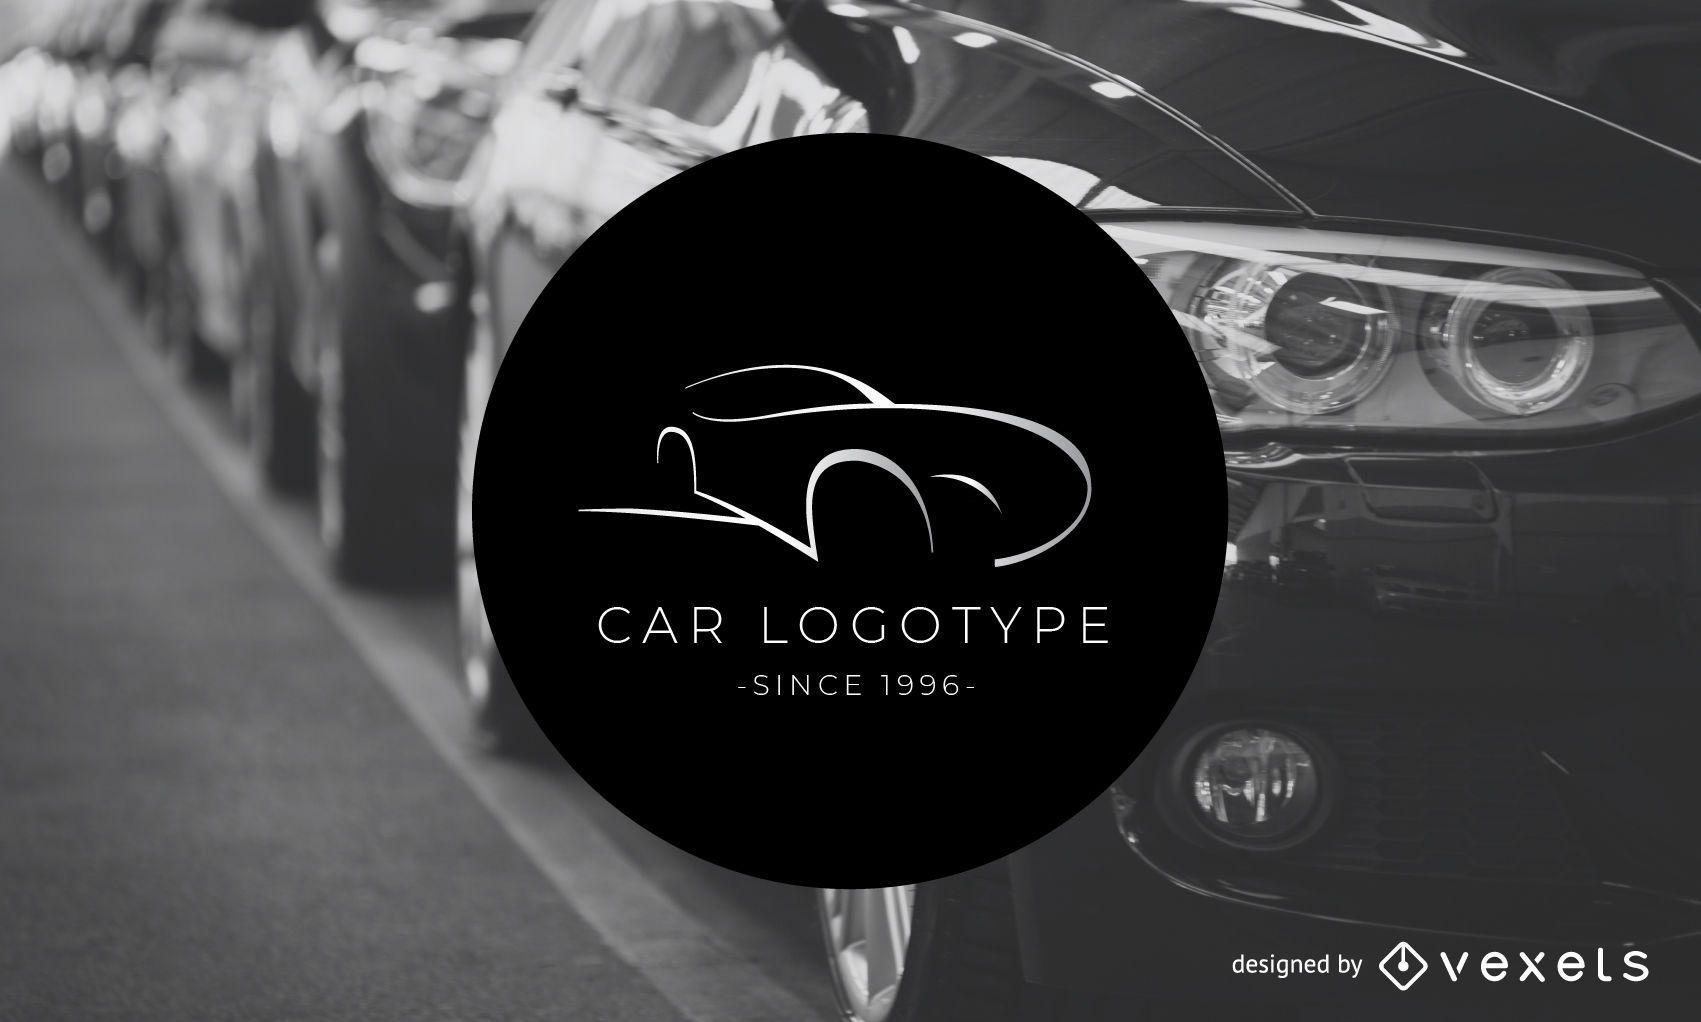 Car logotype logo template - Vector download